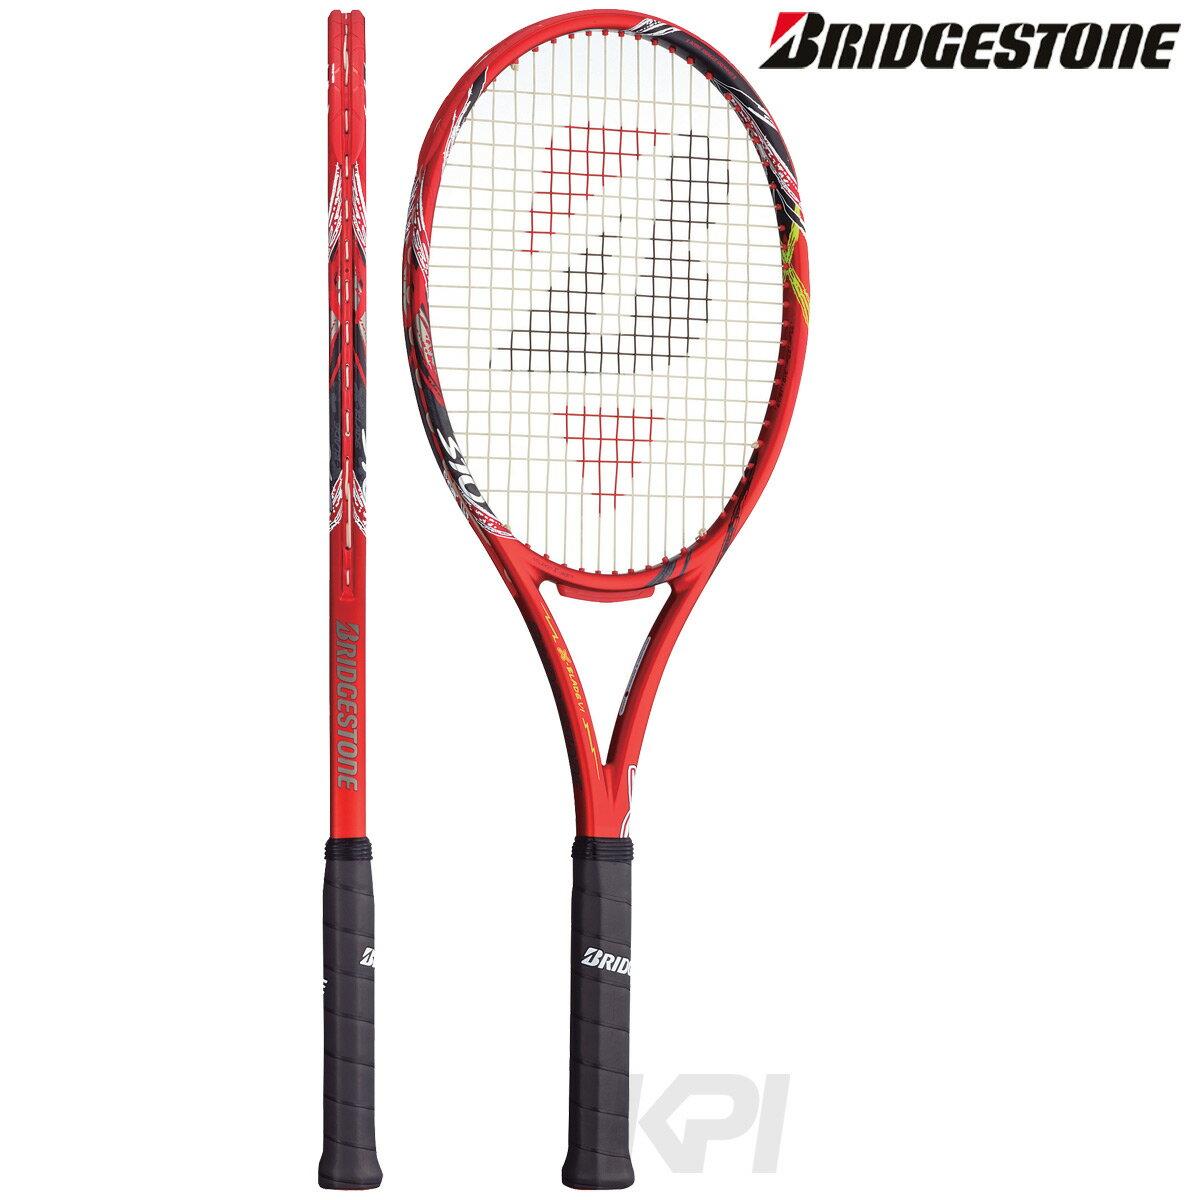 BRIDGESTONE(ブリヂストン)「X-BLADE VI 310(エックスブレードブイアイ310) BRAV61」硬式テニスラケット【prospo】